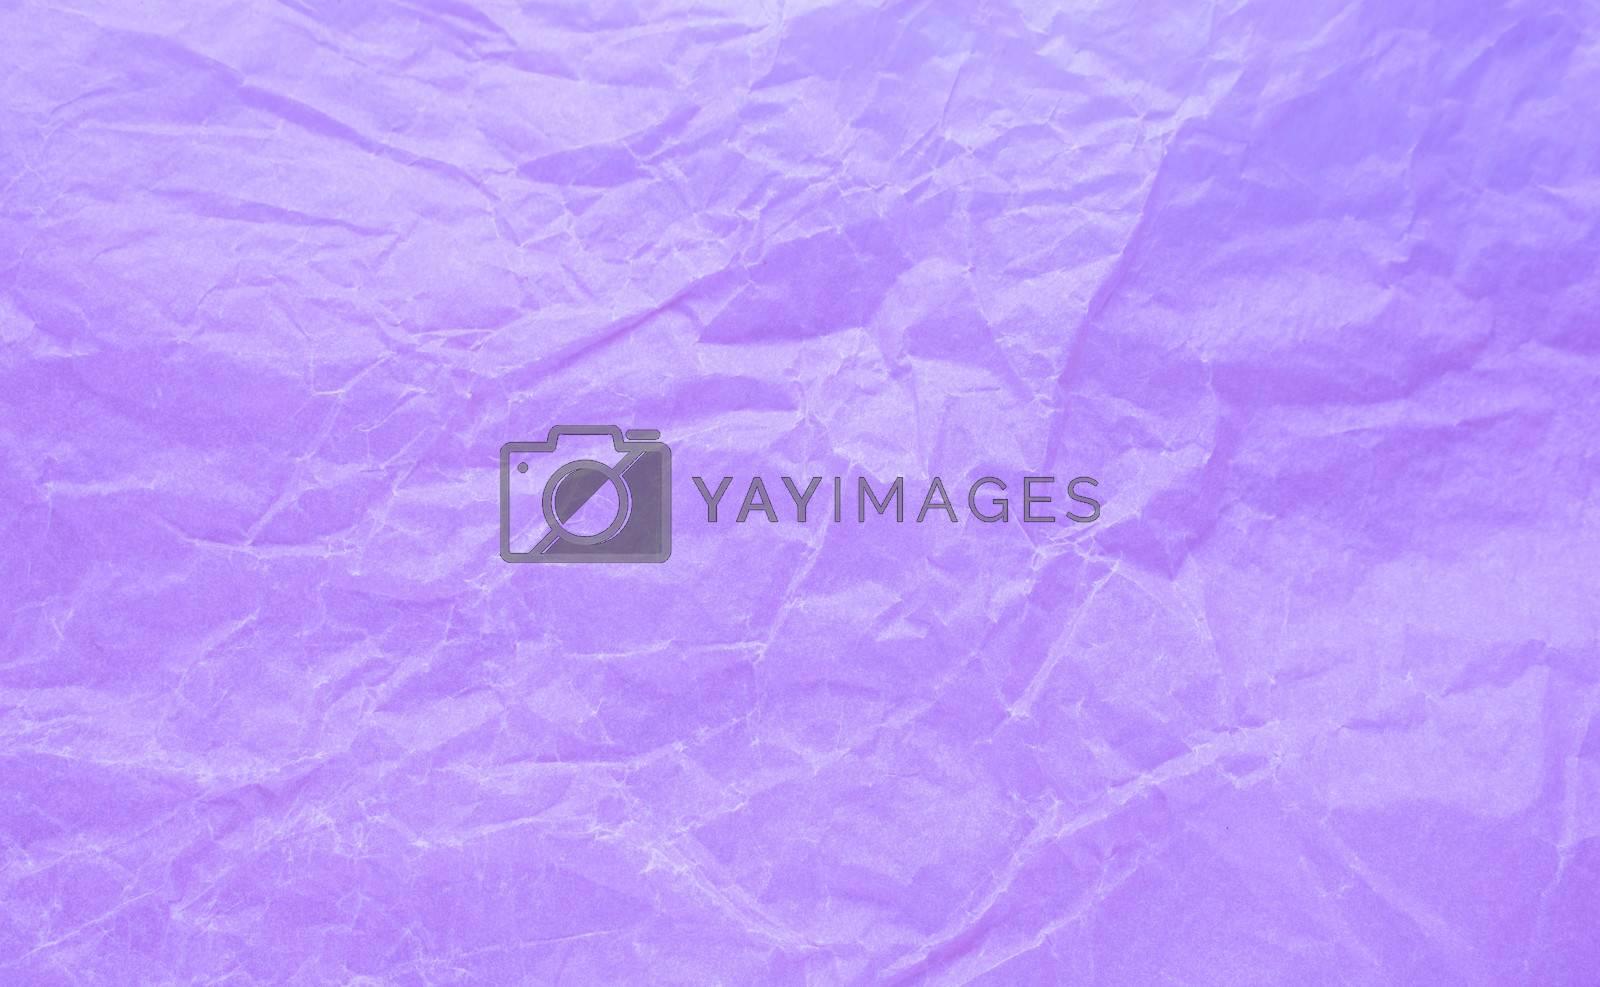 Rumpled paper texture purple. Texture of crumpled paper. Crumpled paper. Wrinkles paper